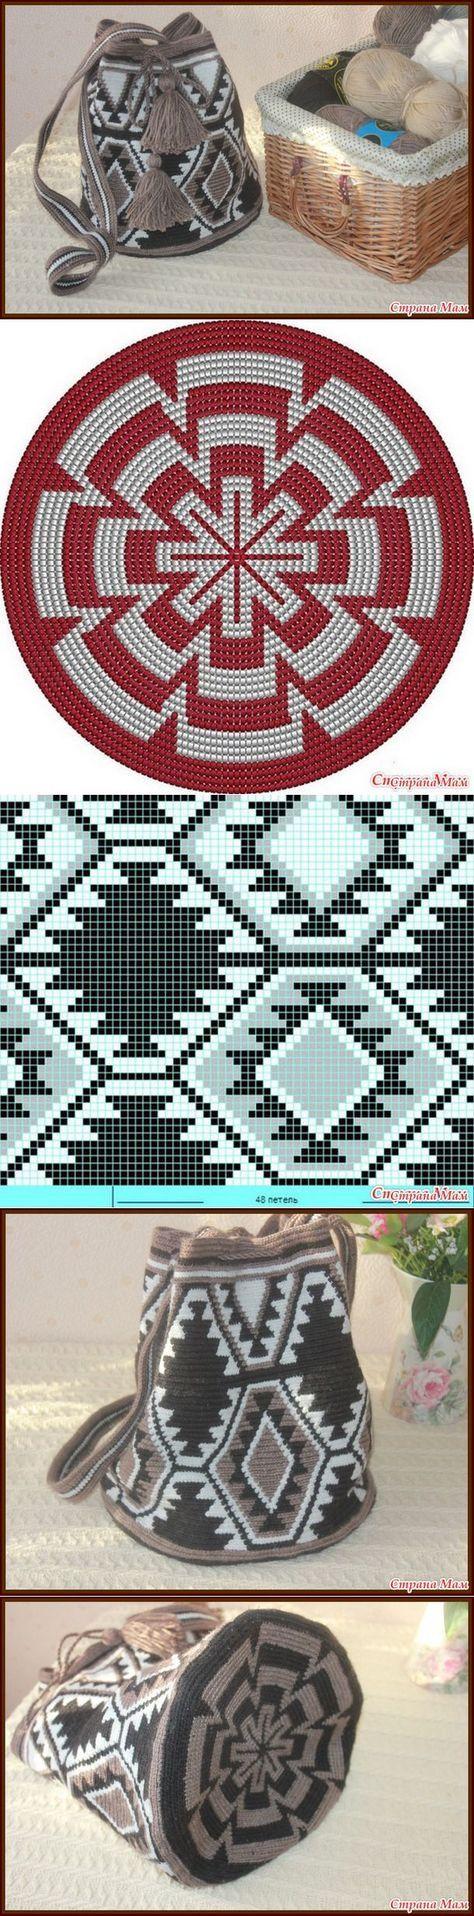 mochila bag crochet pattern fr   crochet   Pinterest   Selfmade